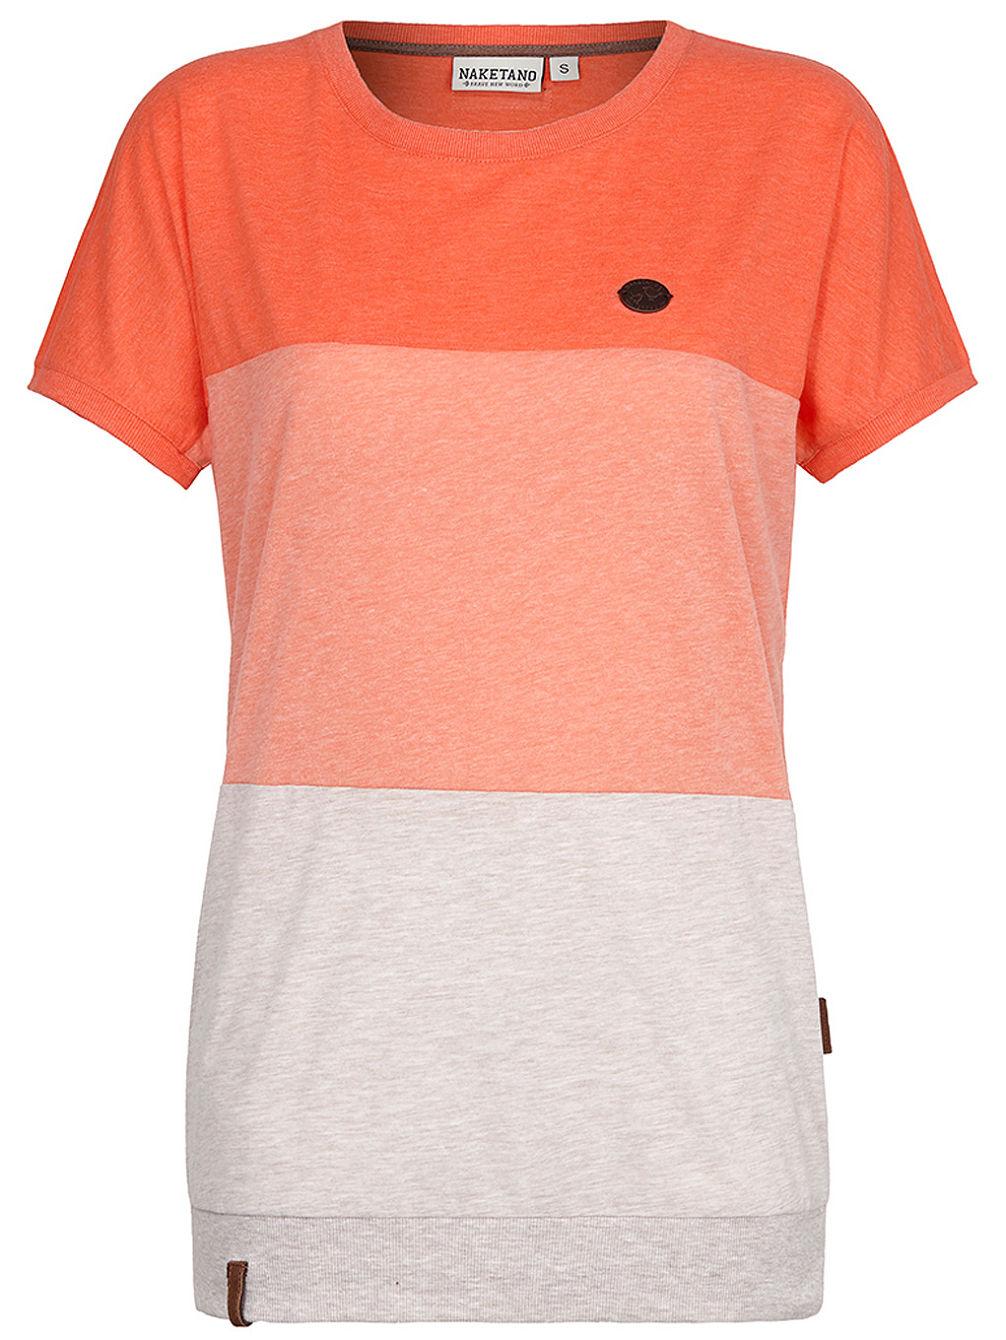 naketano-meinen-ruecken-schmuecken-iv-t-shirt